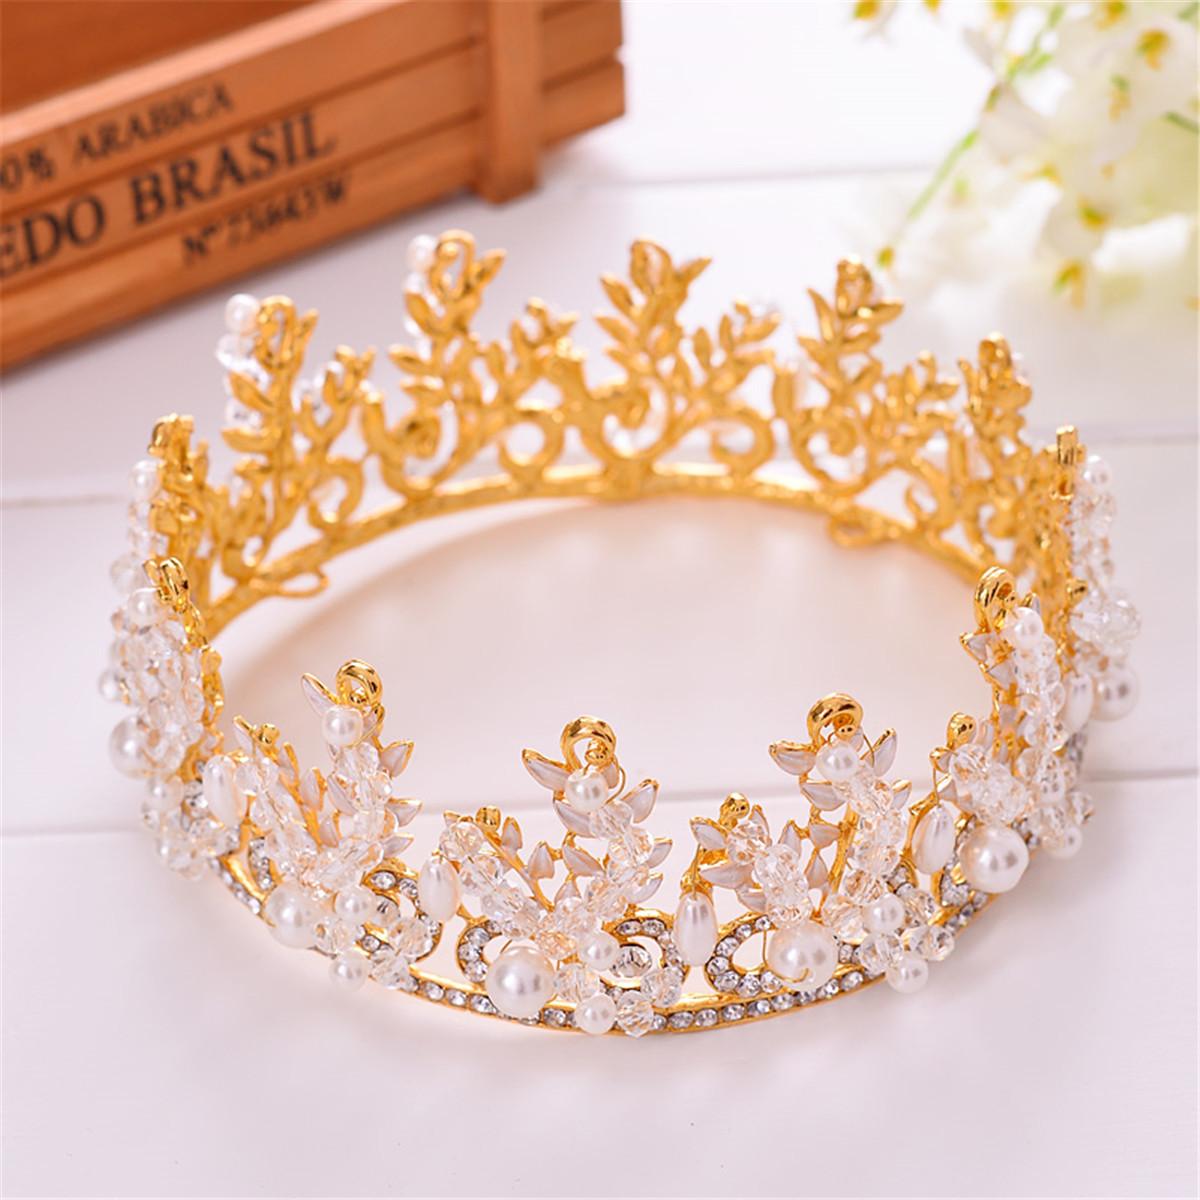 Bride Rhinestone Crystal Pearl Crown Tiara Head Jewelry Princess Queen Headpiece Wedding Accessories